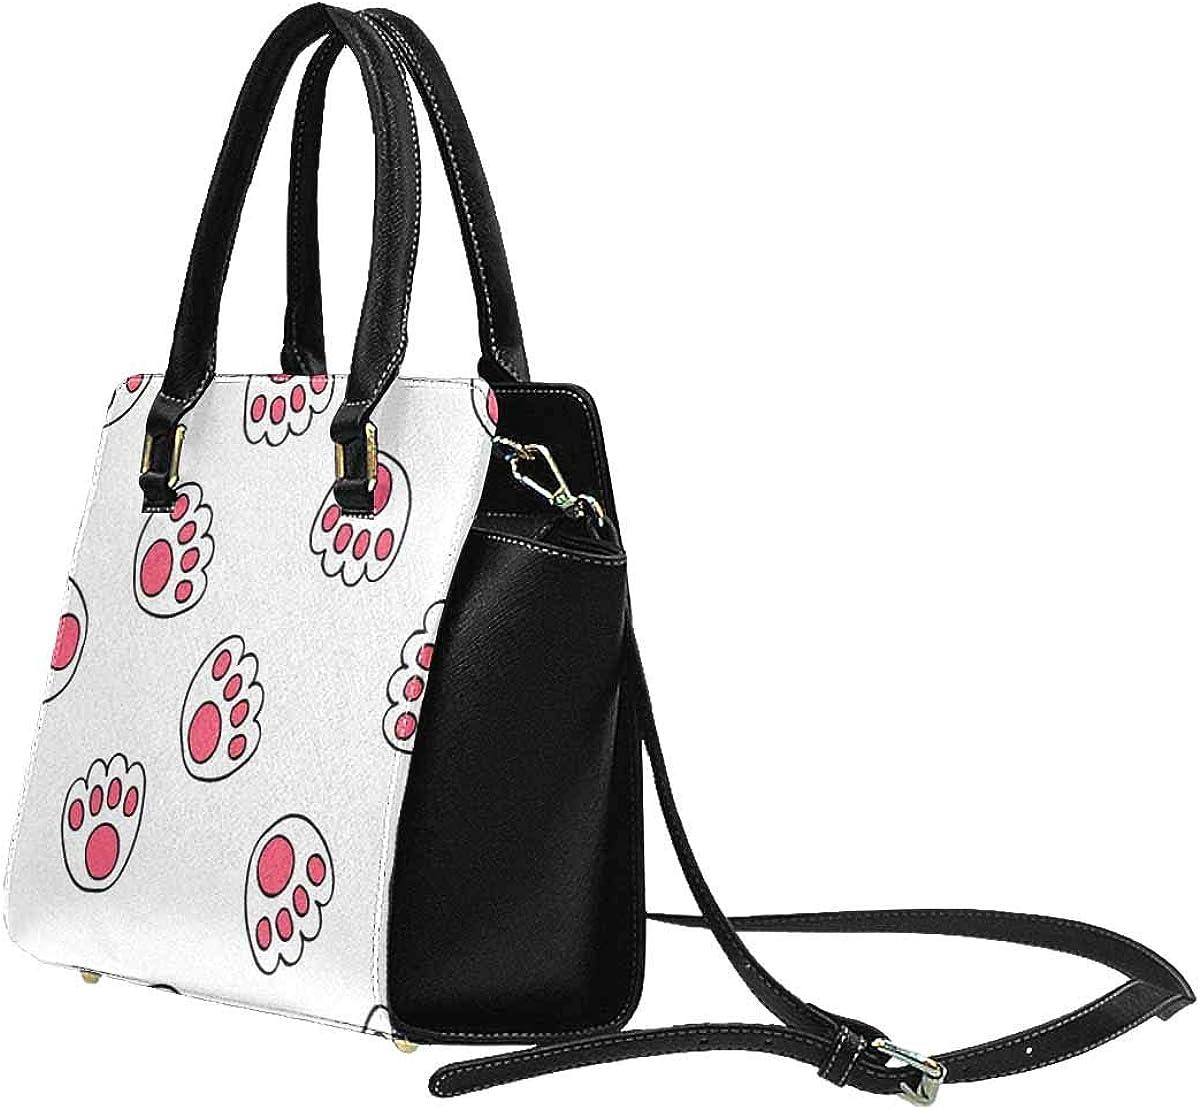 INTERESTPRINT Paw Pattern Rive Shoulder Bags Satchel Handbags for Women Fashion Ladies